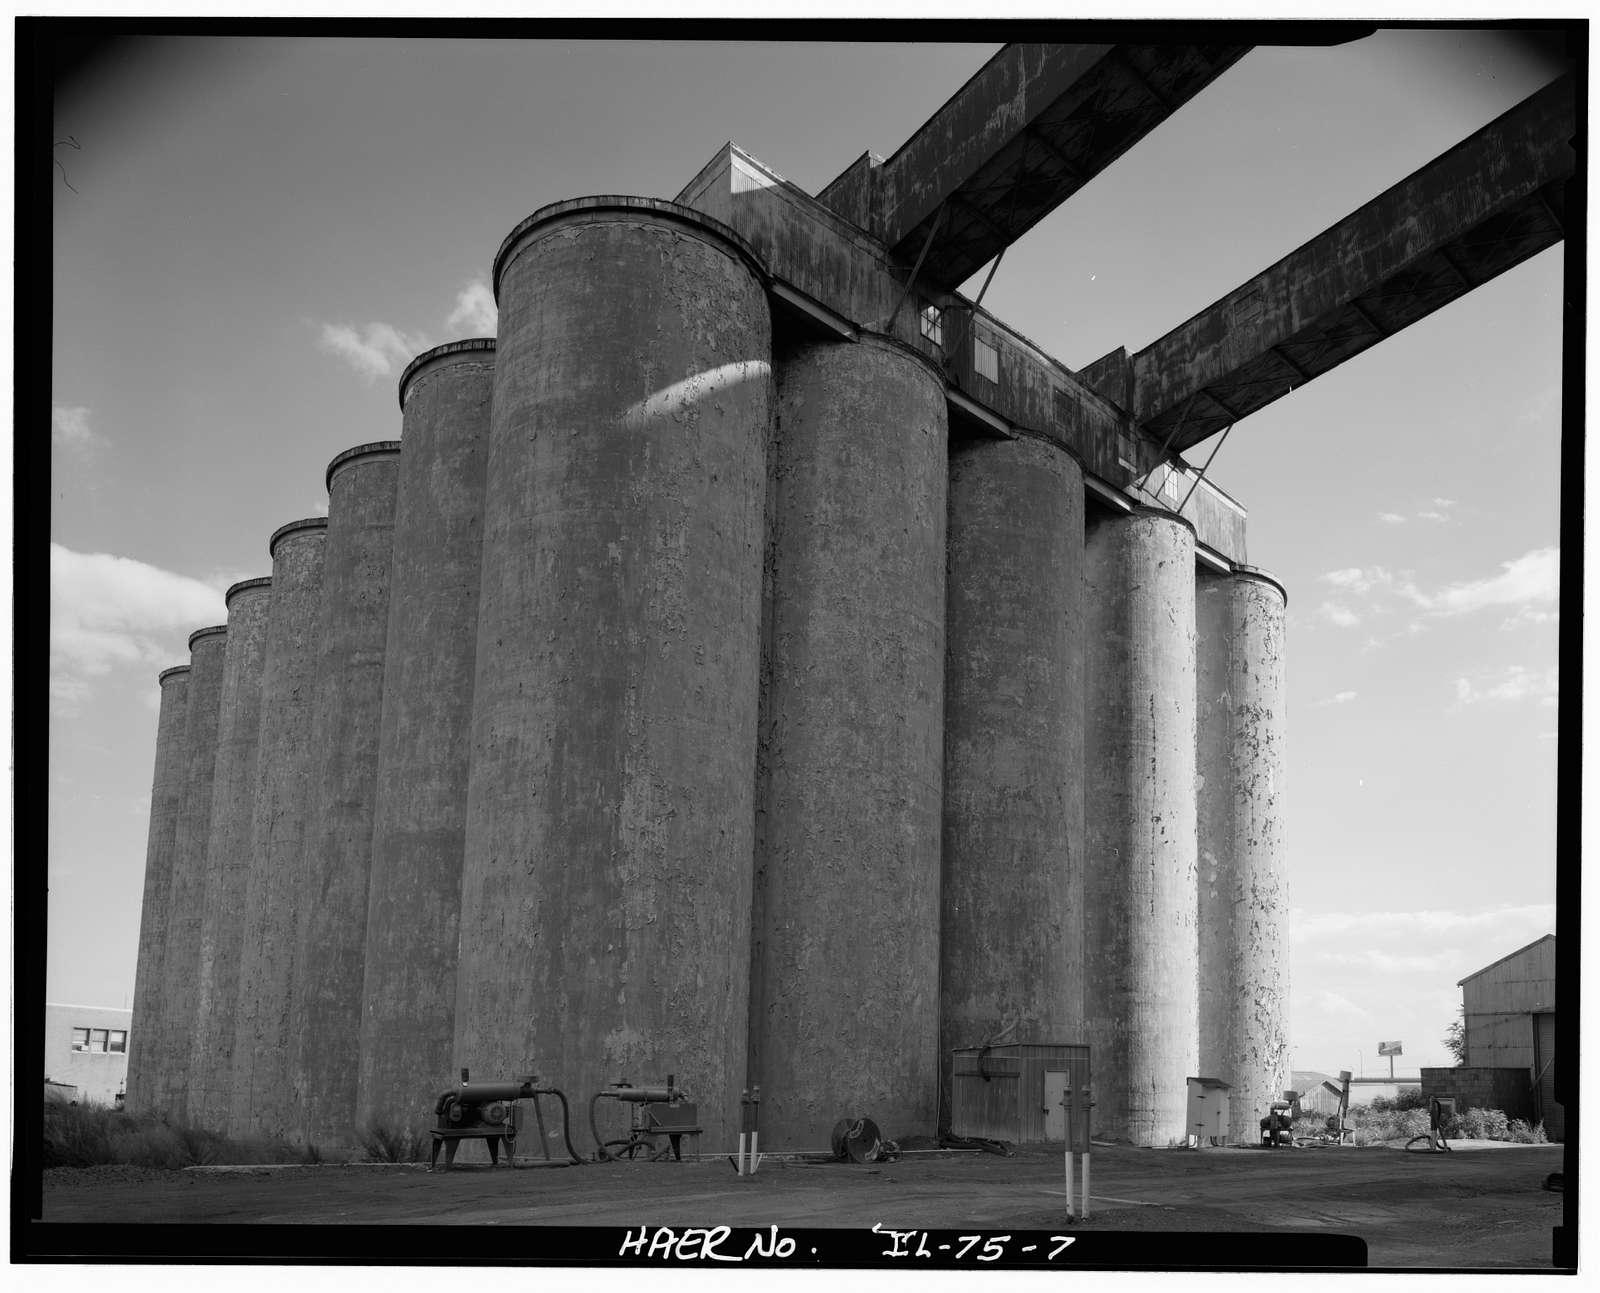 Santa Fe Railroad, Grain Elevator, On Atchison, Topeka & Santa Fe Railroad slip, South side of sanitary & ship canal, Chicago, Cook County, IL